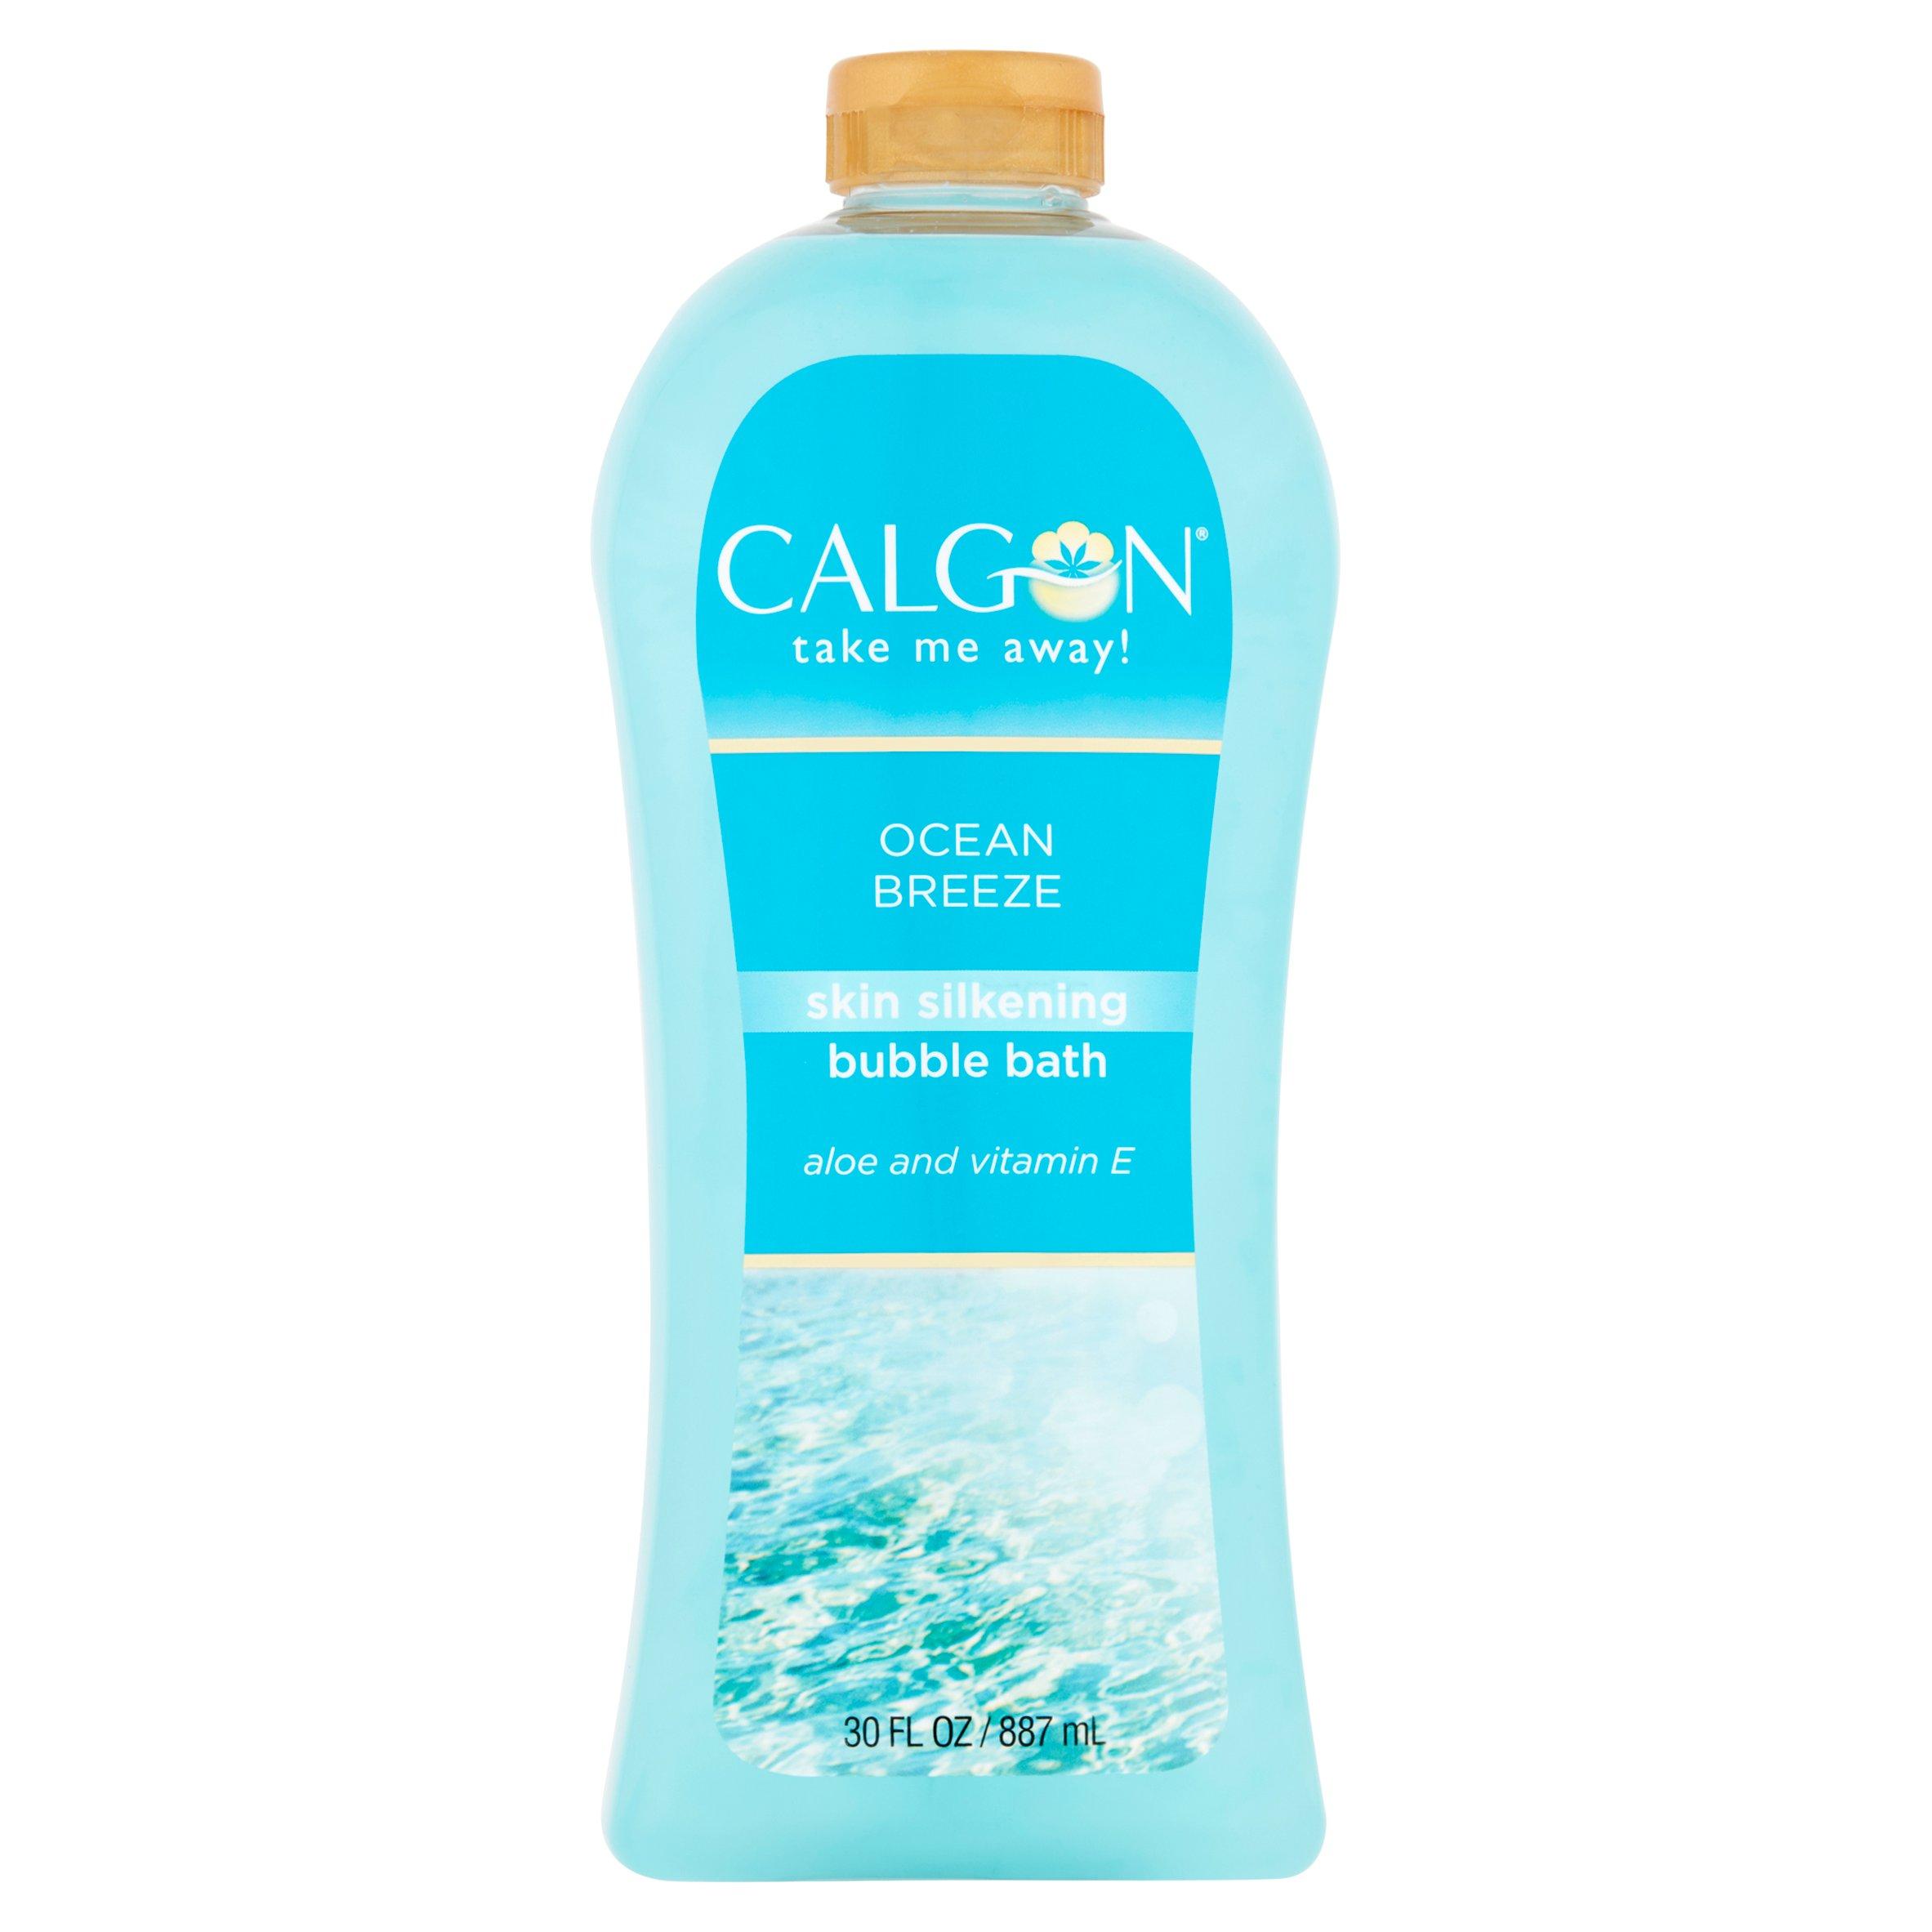 Calgon Ocean Breeze Moisturizing Bubble Bath, 30 fl oz